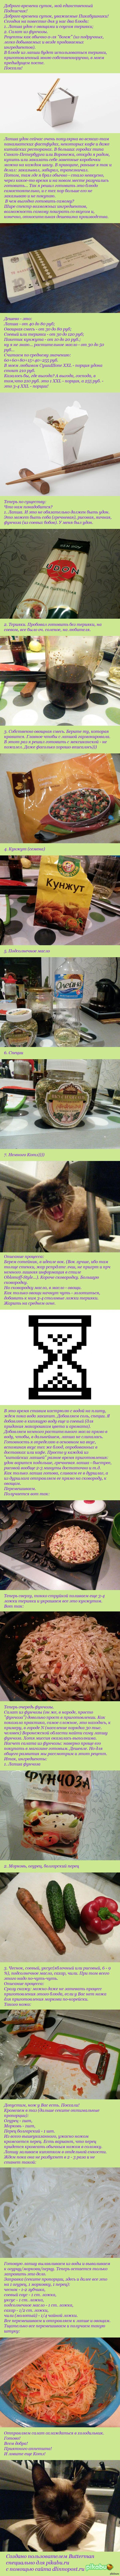 "Лапша удон с овощами + Бонус: Салат из фунчозы. Как готовить терияки - см. <a href=""http://pikabu.ru/story/sous_teriyaki_svoimi_rukami_2830764"">http://pikabu.ru/story/_2830764</a>"